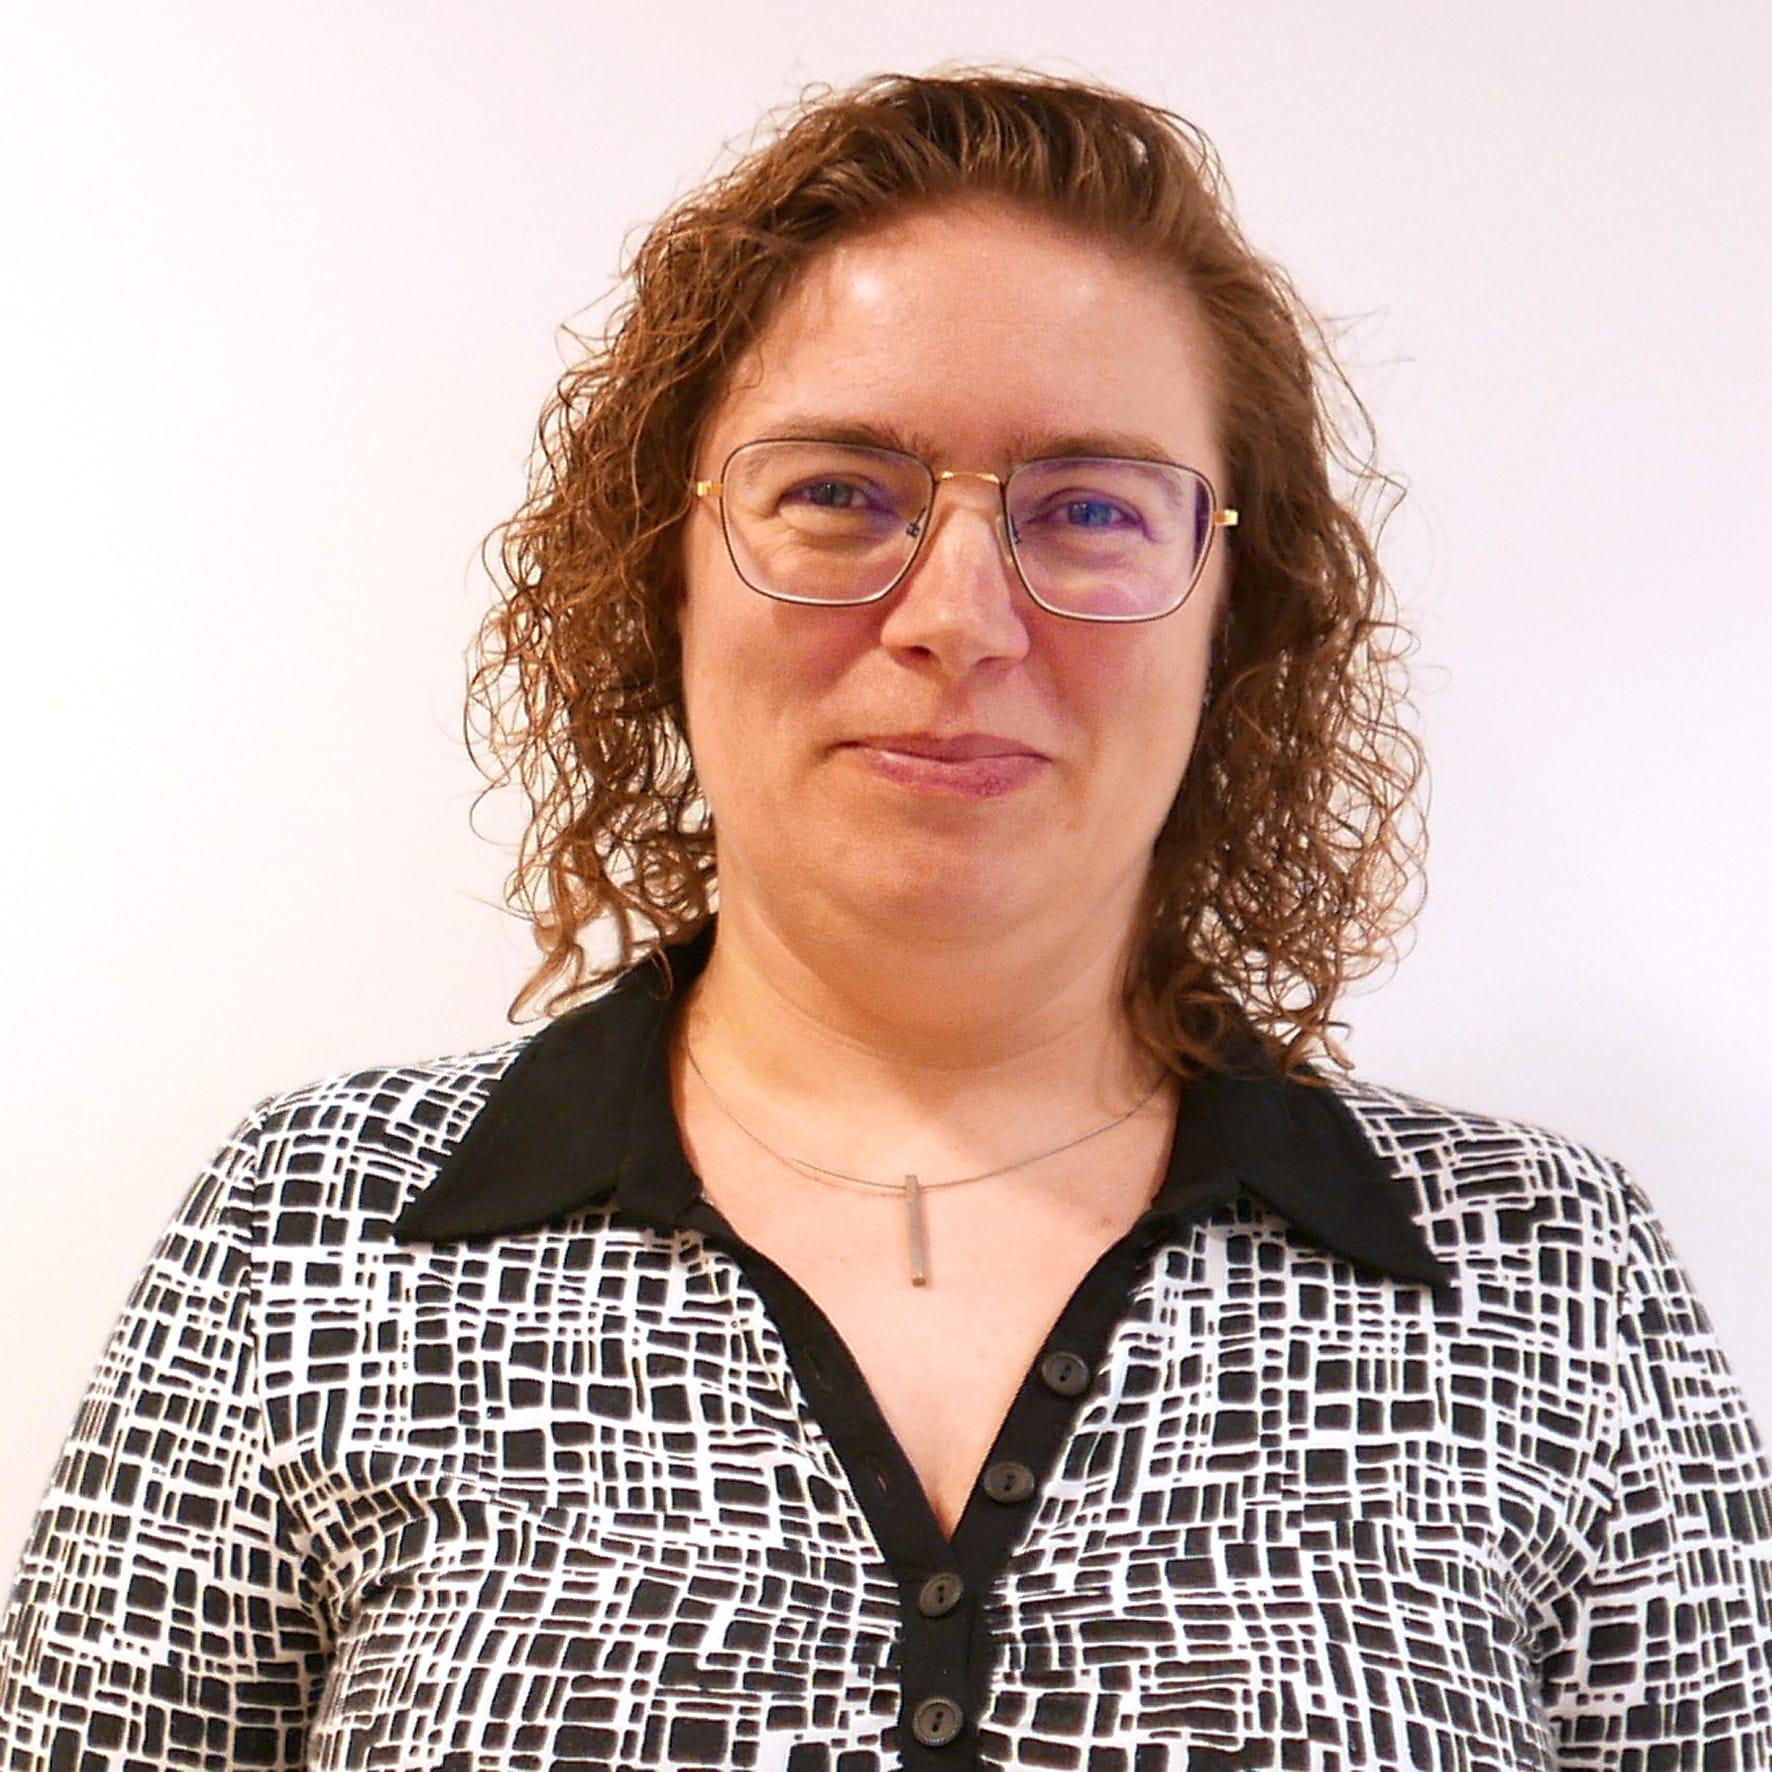 Nathalie Breugelmans